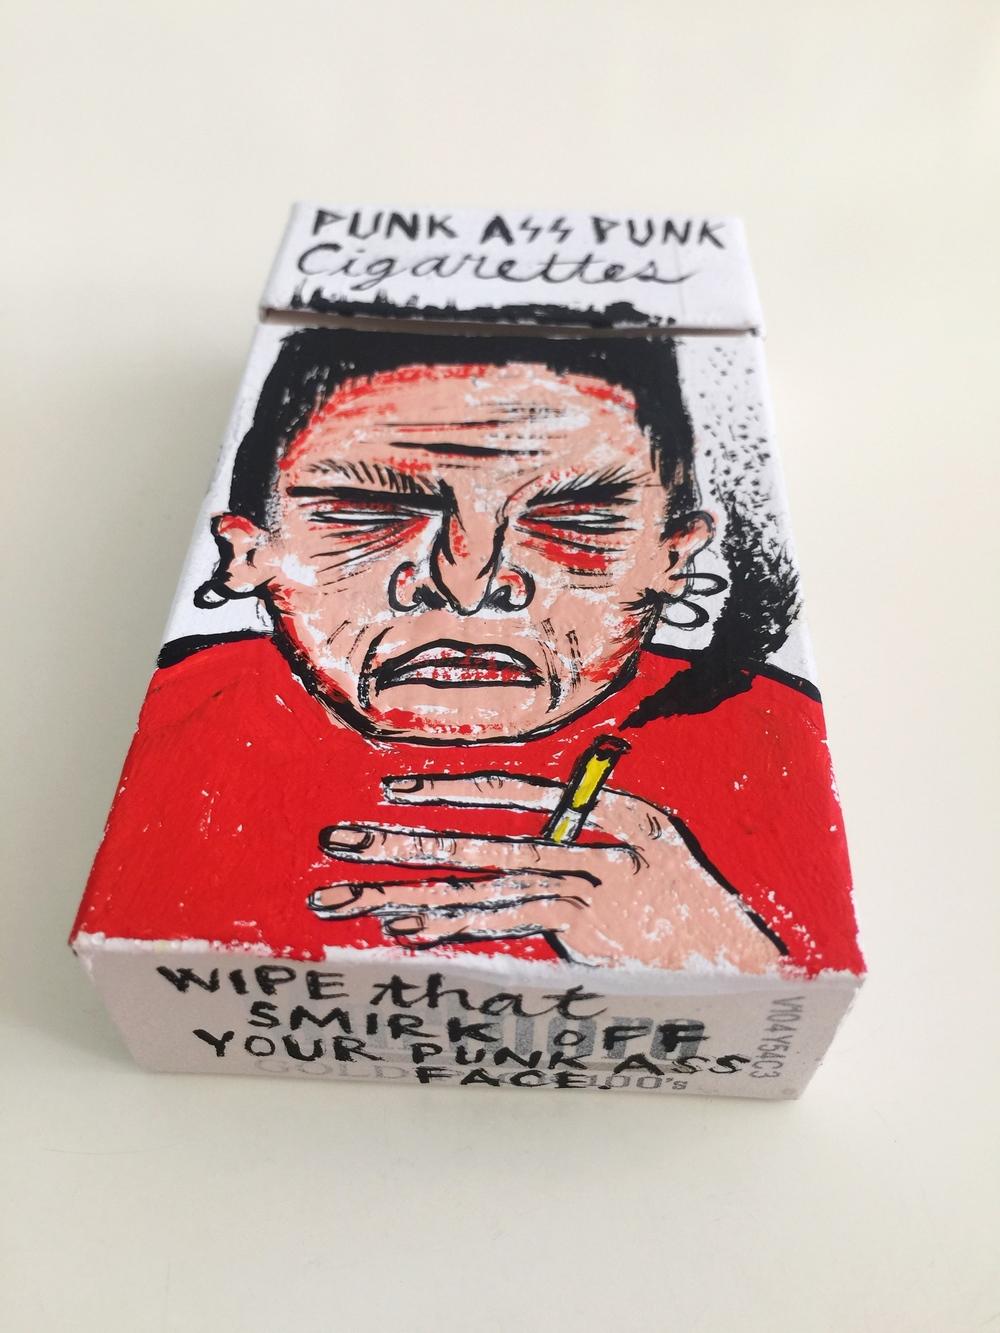 PUNK ASS PUNK CIGARETTES